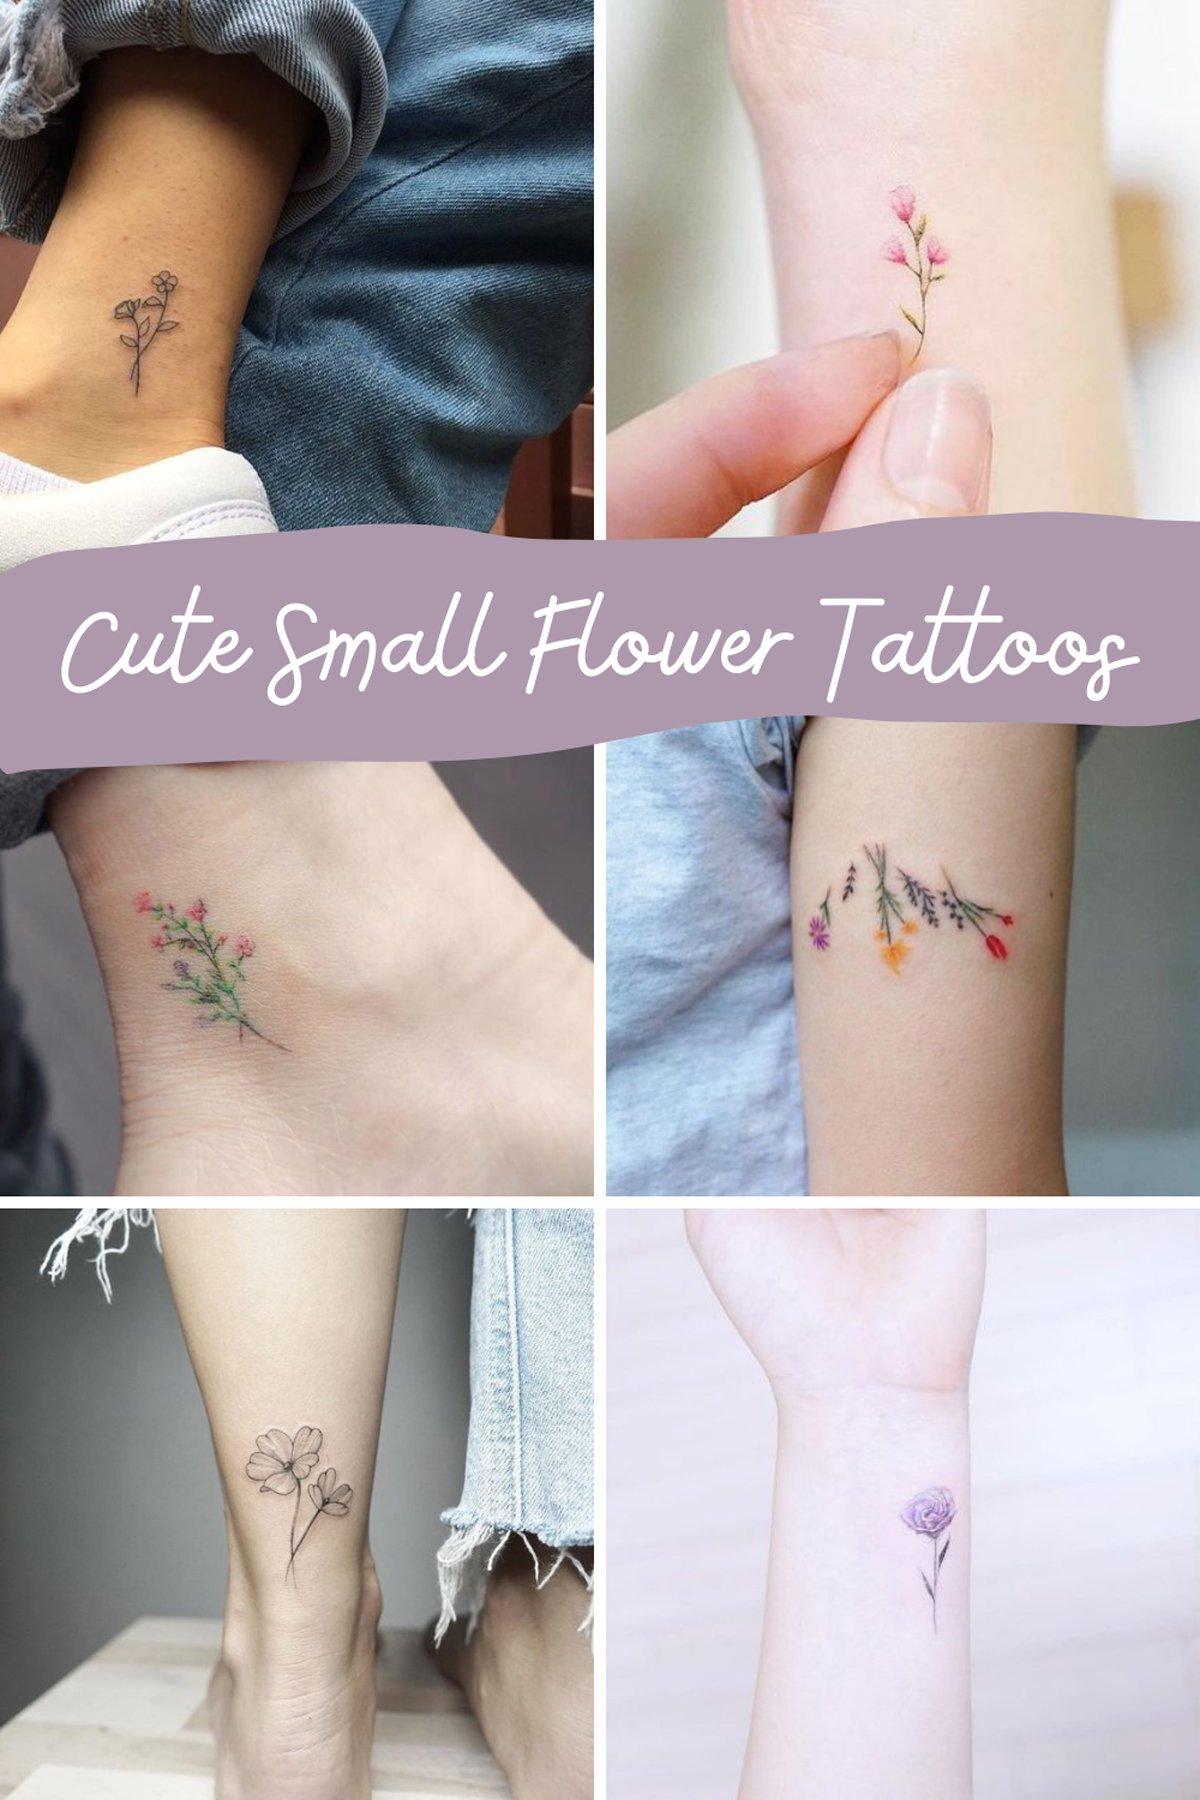 Cute Small Floral Tattoos